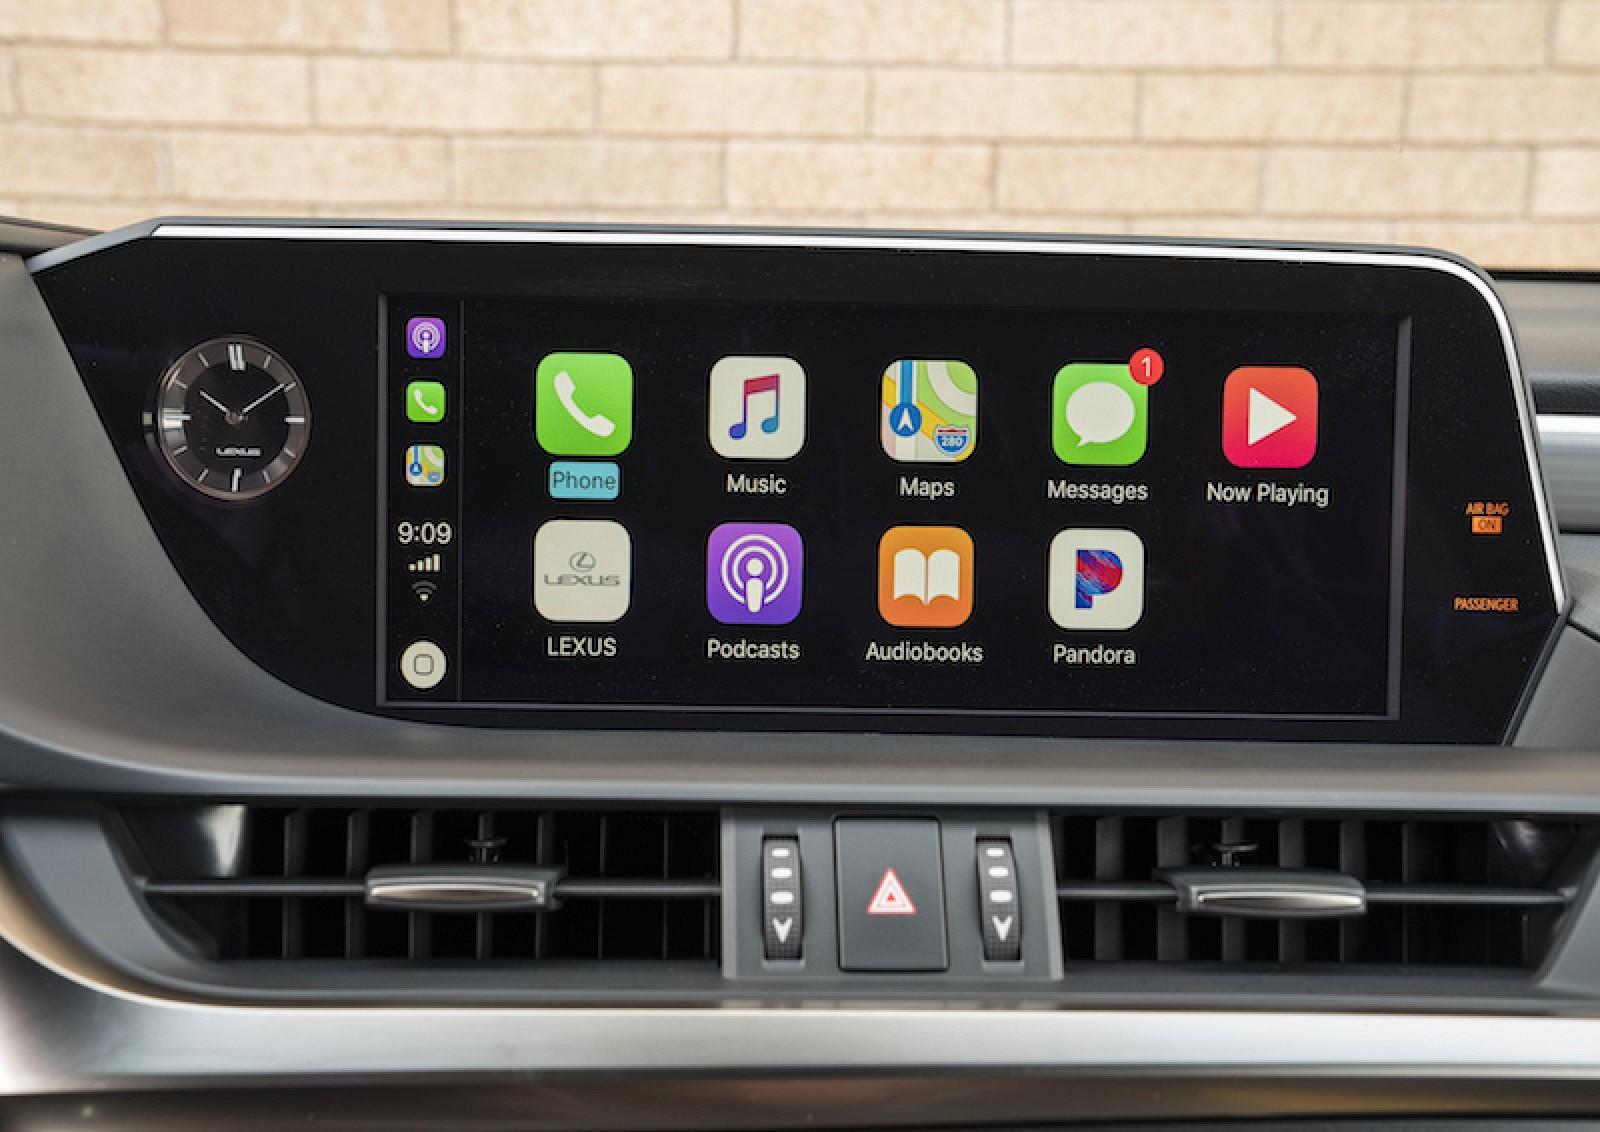 Lexus To Begin Carplay Rollout In New Vehicles In September Macrumors